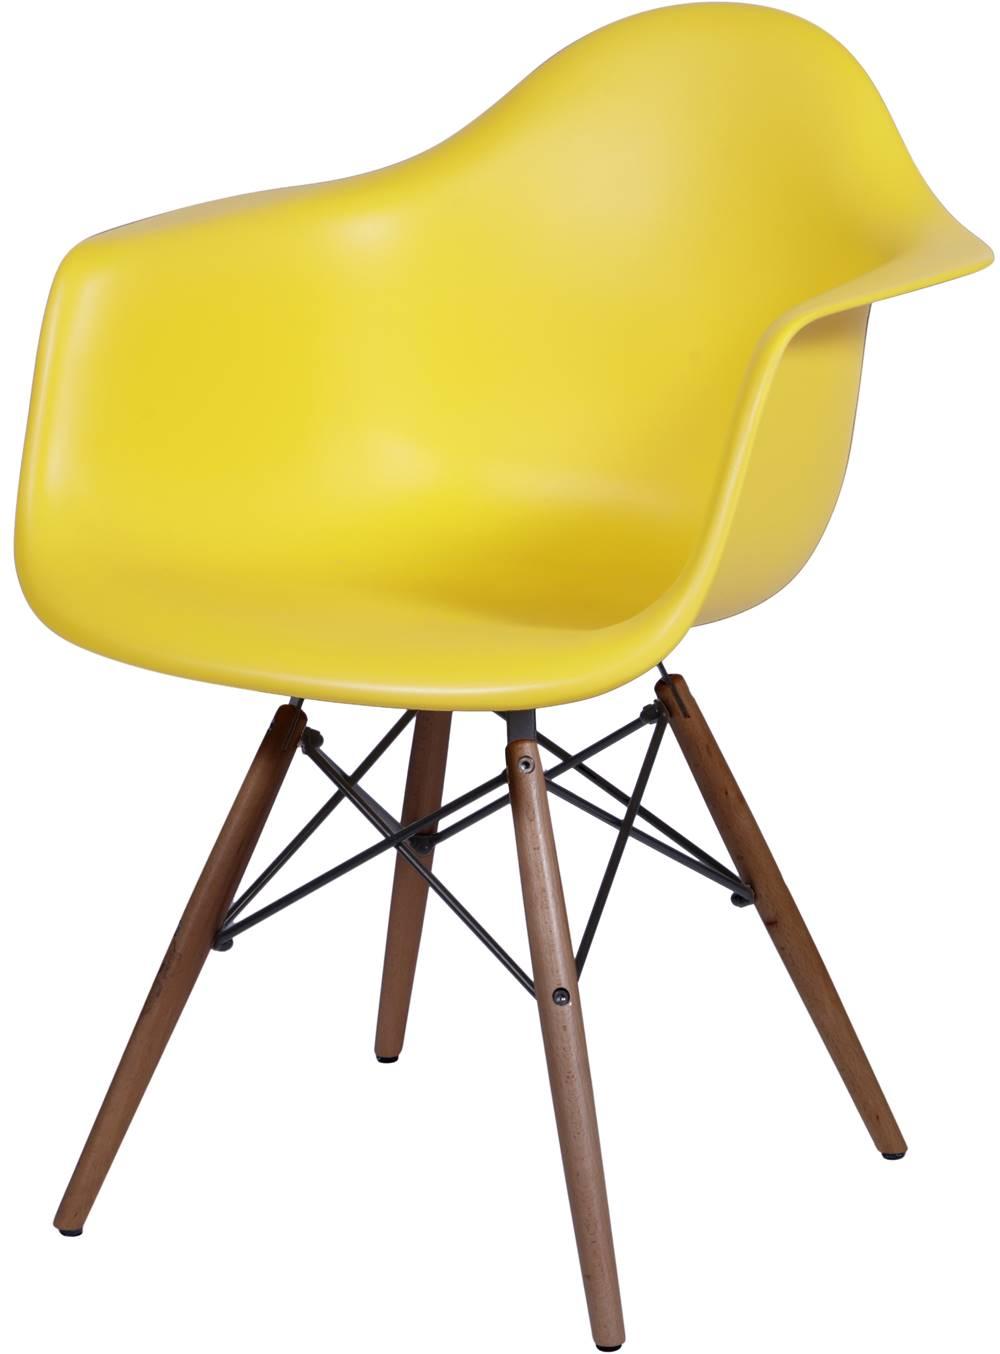 Cadeira Eames com Braco Base Escura Amarela Fosco - 44880